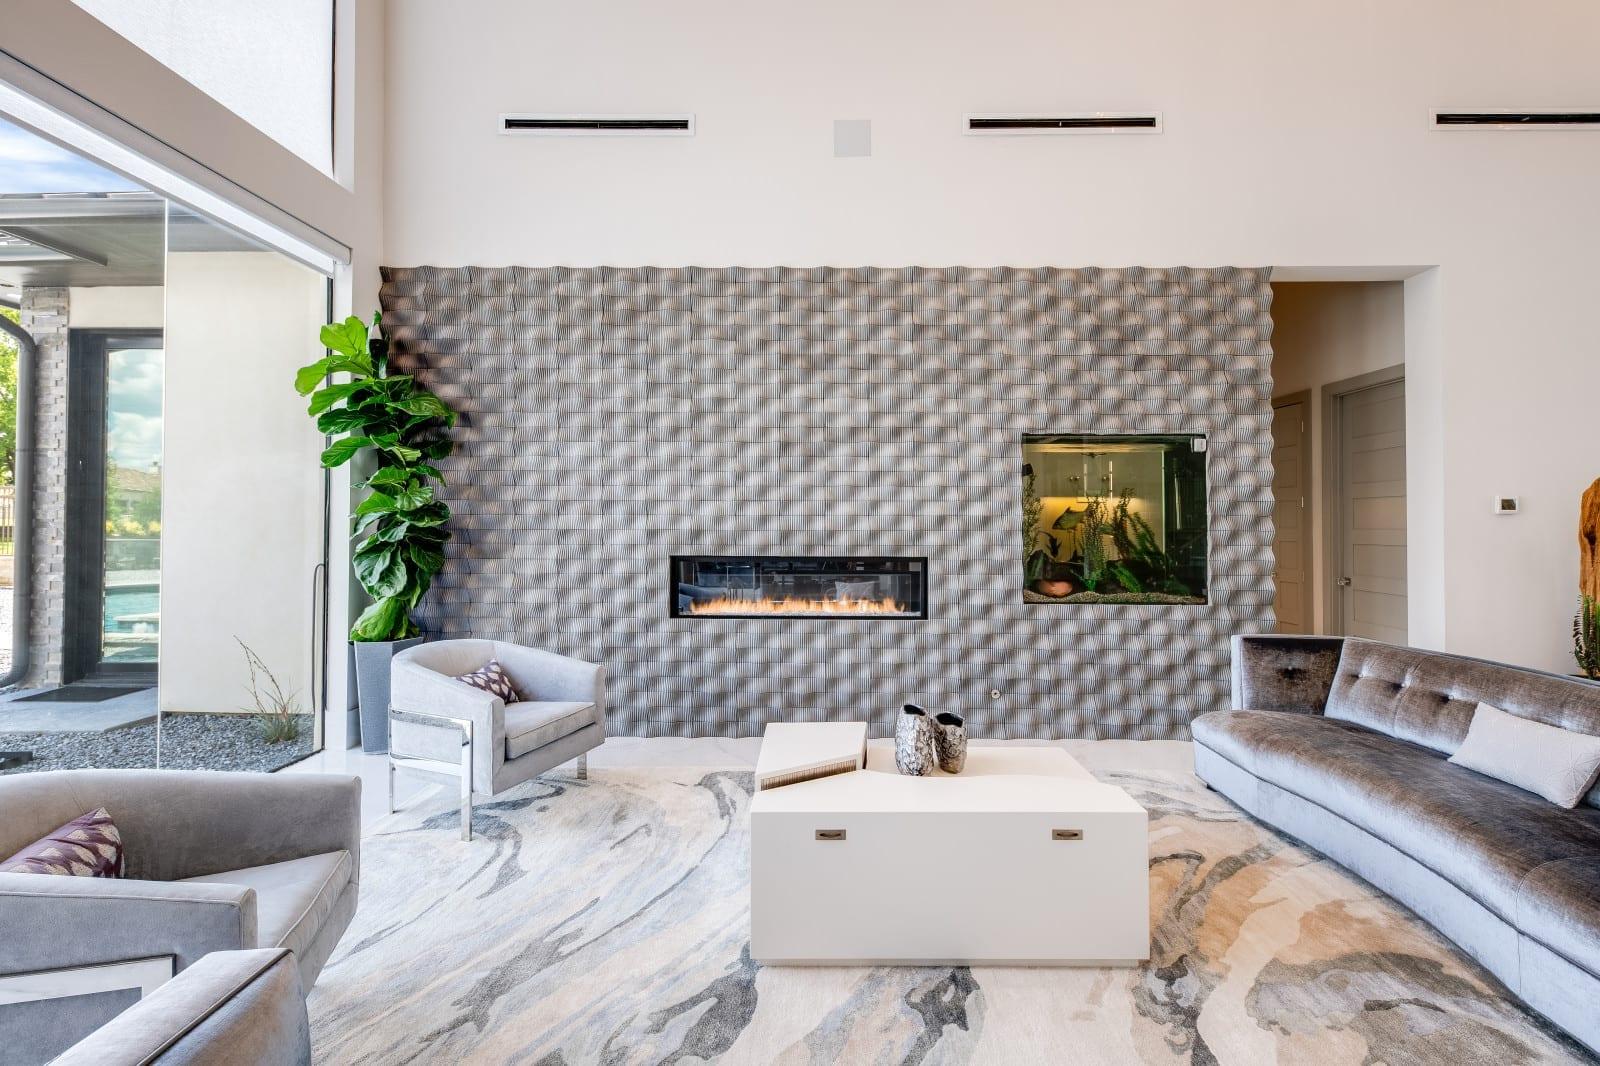 Custom Home Build and Interior Design # 30 - Millennial Design + Build, Home Builders in Dallas Texas, modern style homes, and custom home builders in DFW